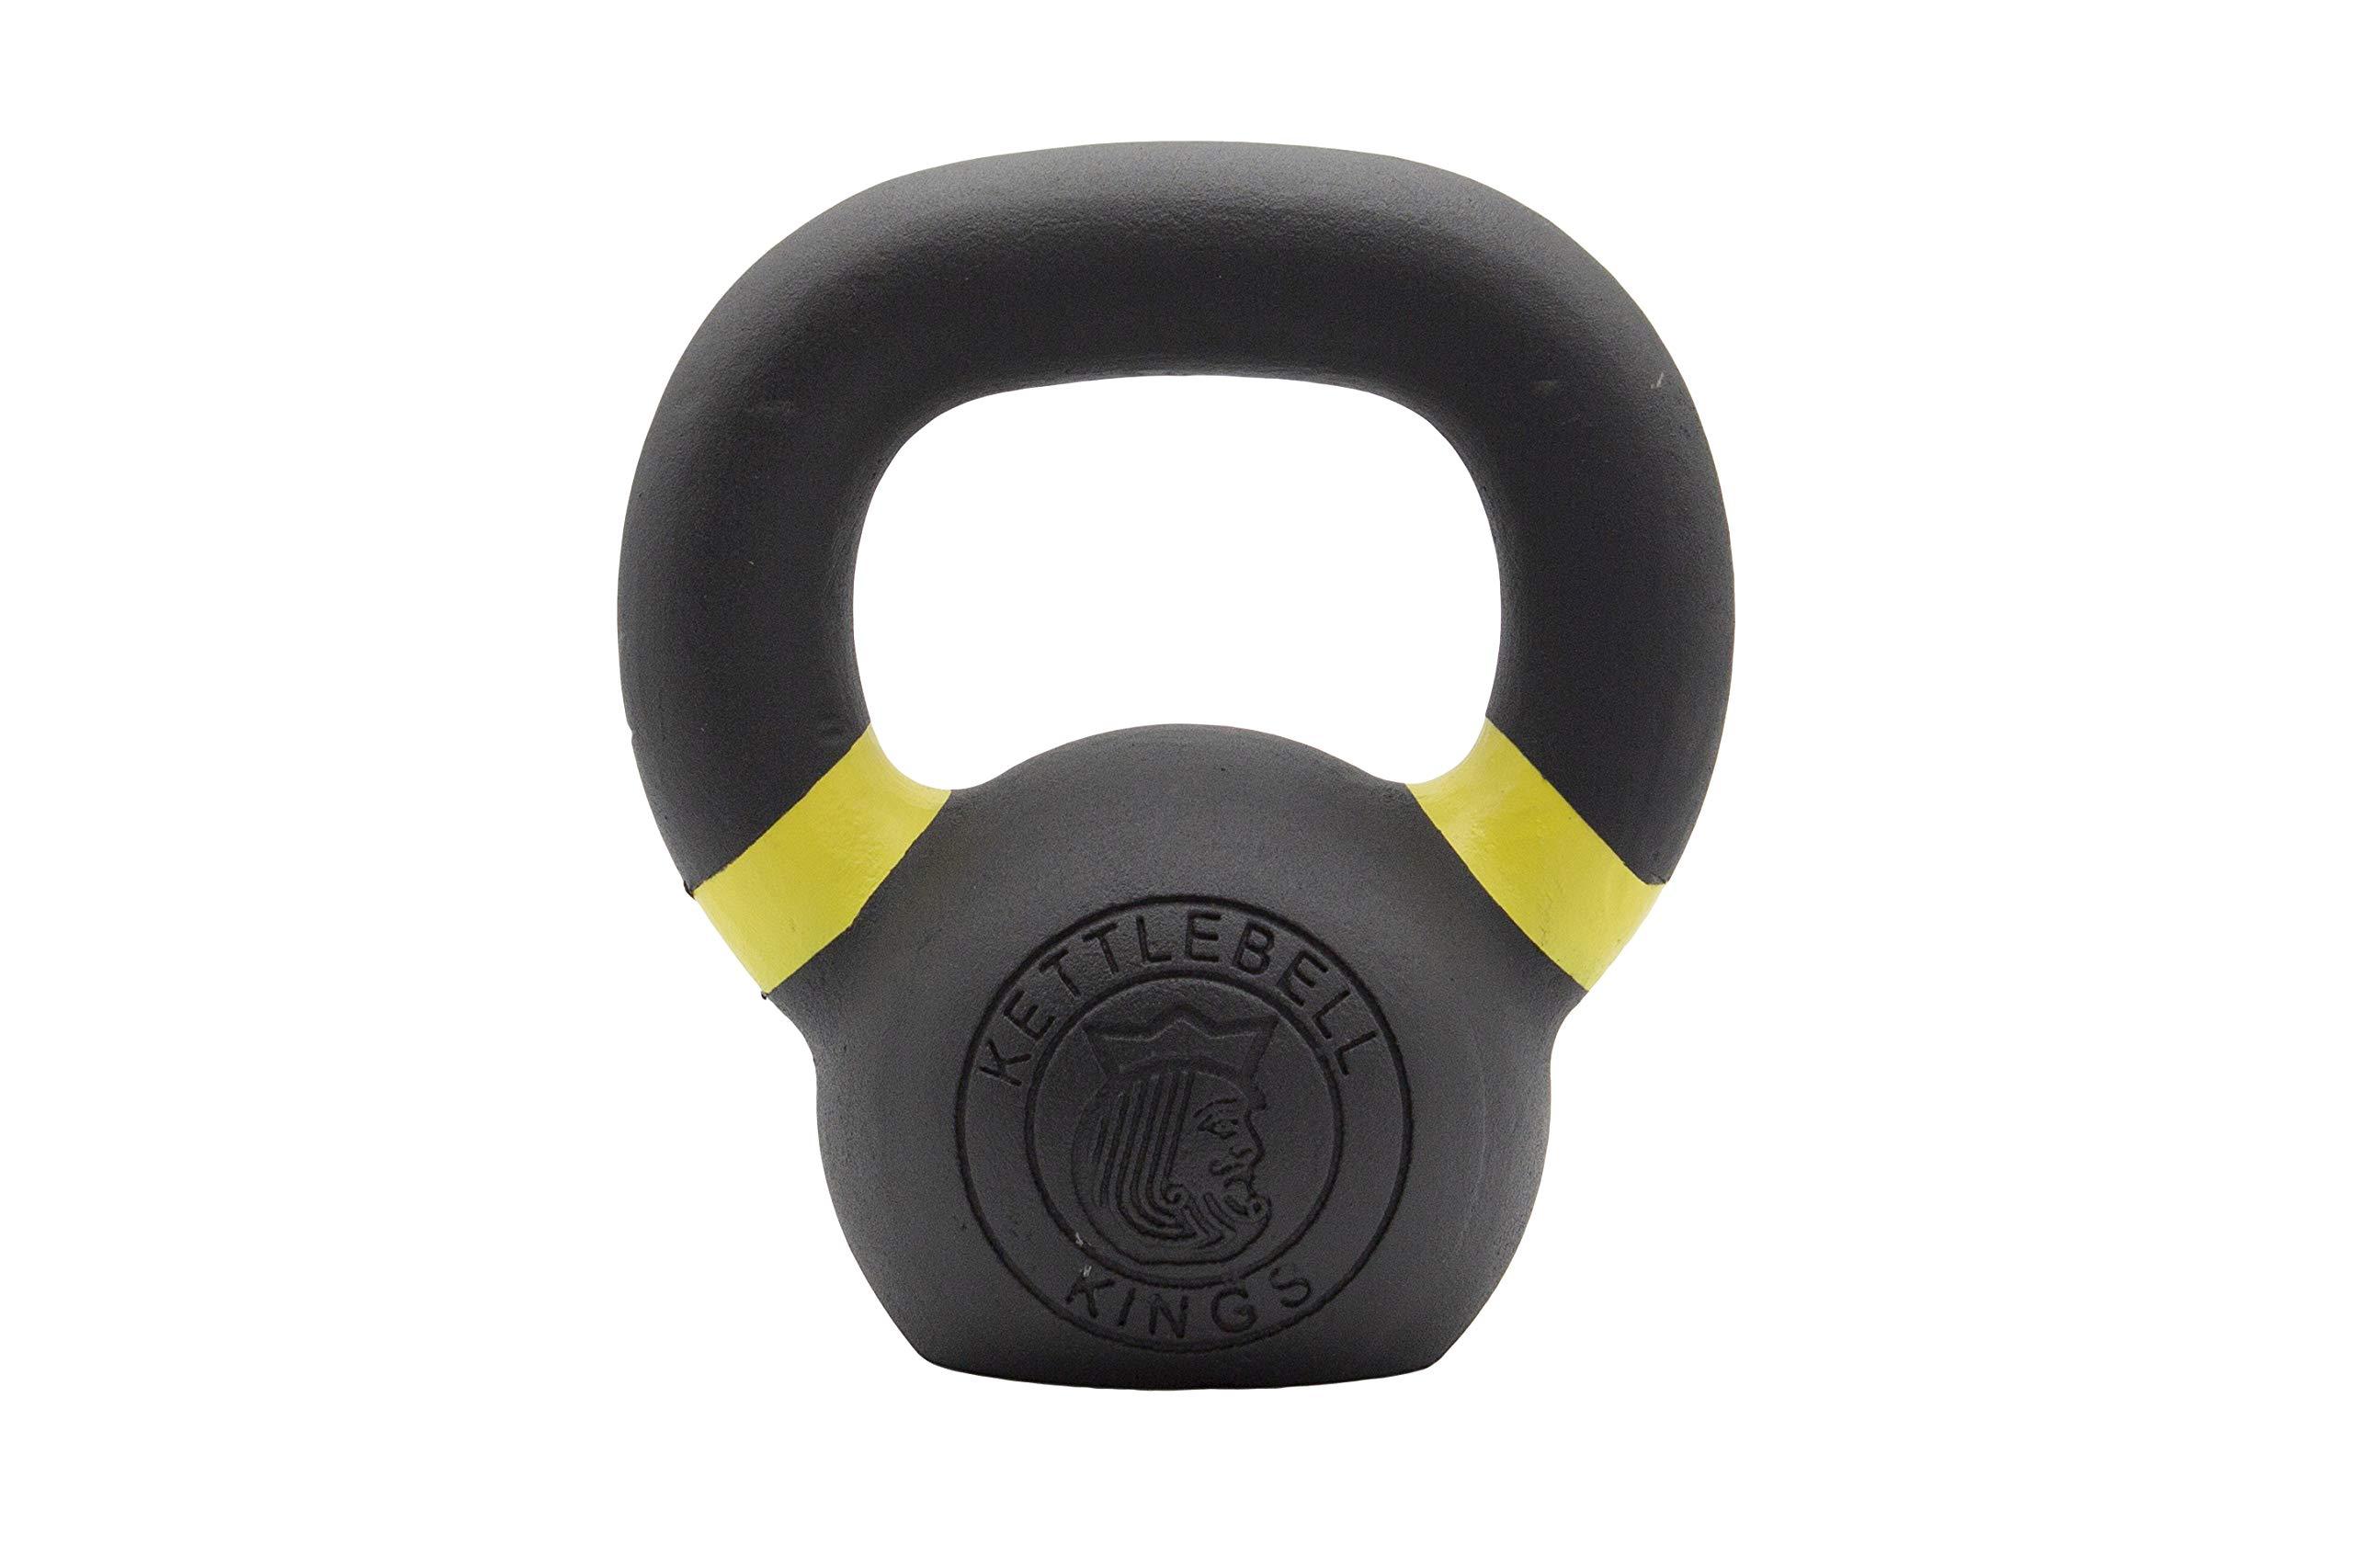 Kettlebell Kings | Kettlebell Weights | Powder Coat Kettlebell Weights for Women & Men | Powder Coating for Durability, Rust Resistance & Longevity (4)